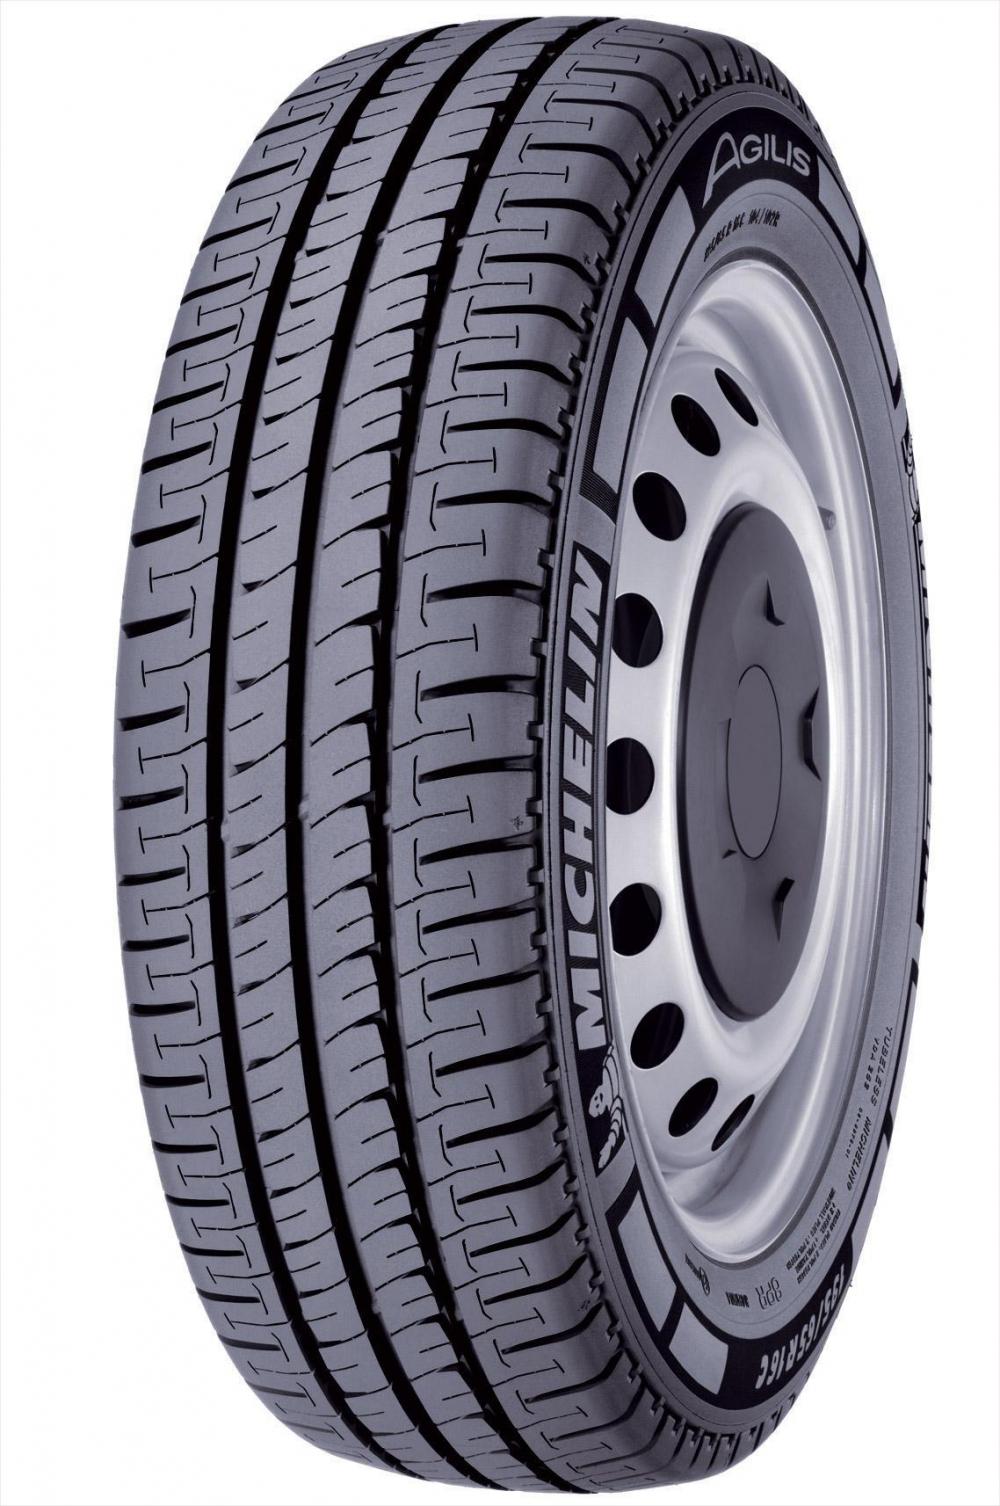 Michelin AGILISPLUS gumiabroncs